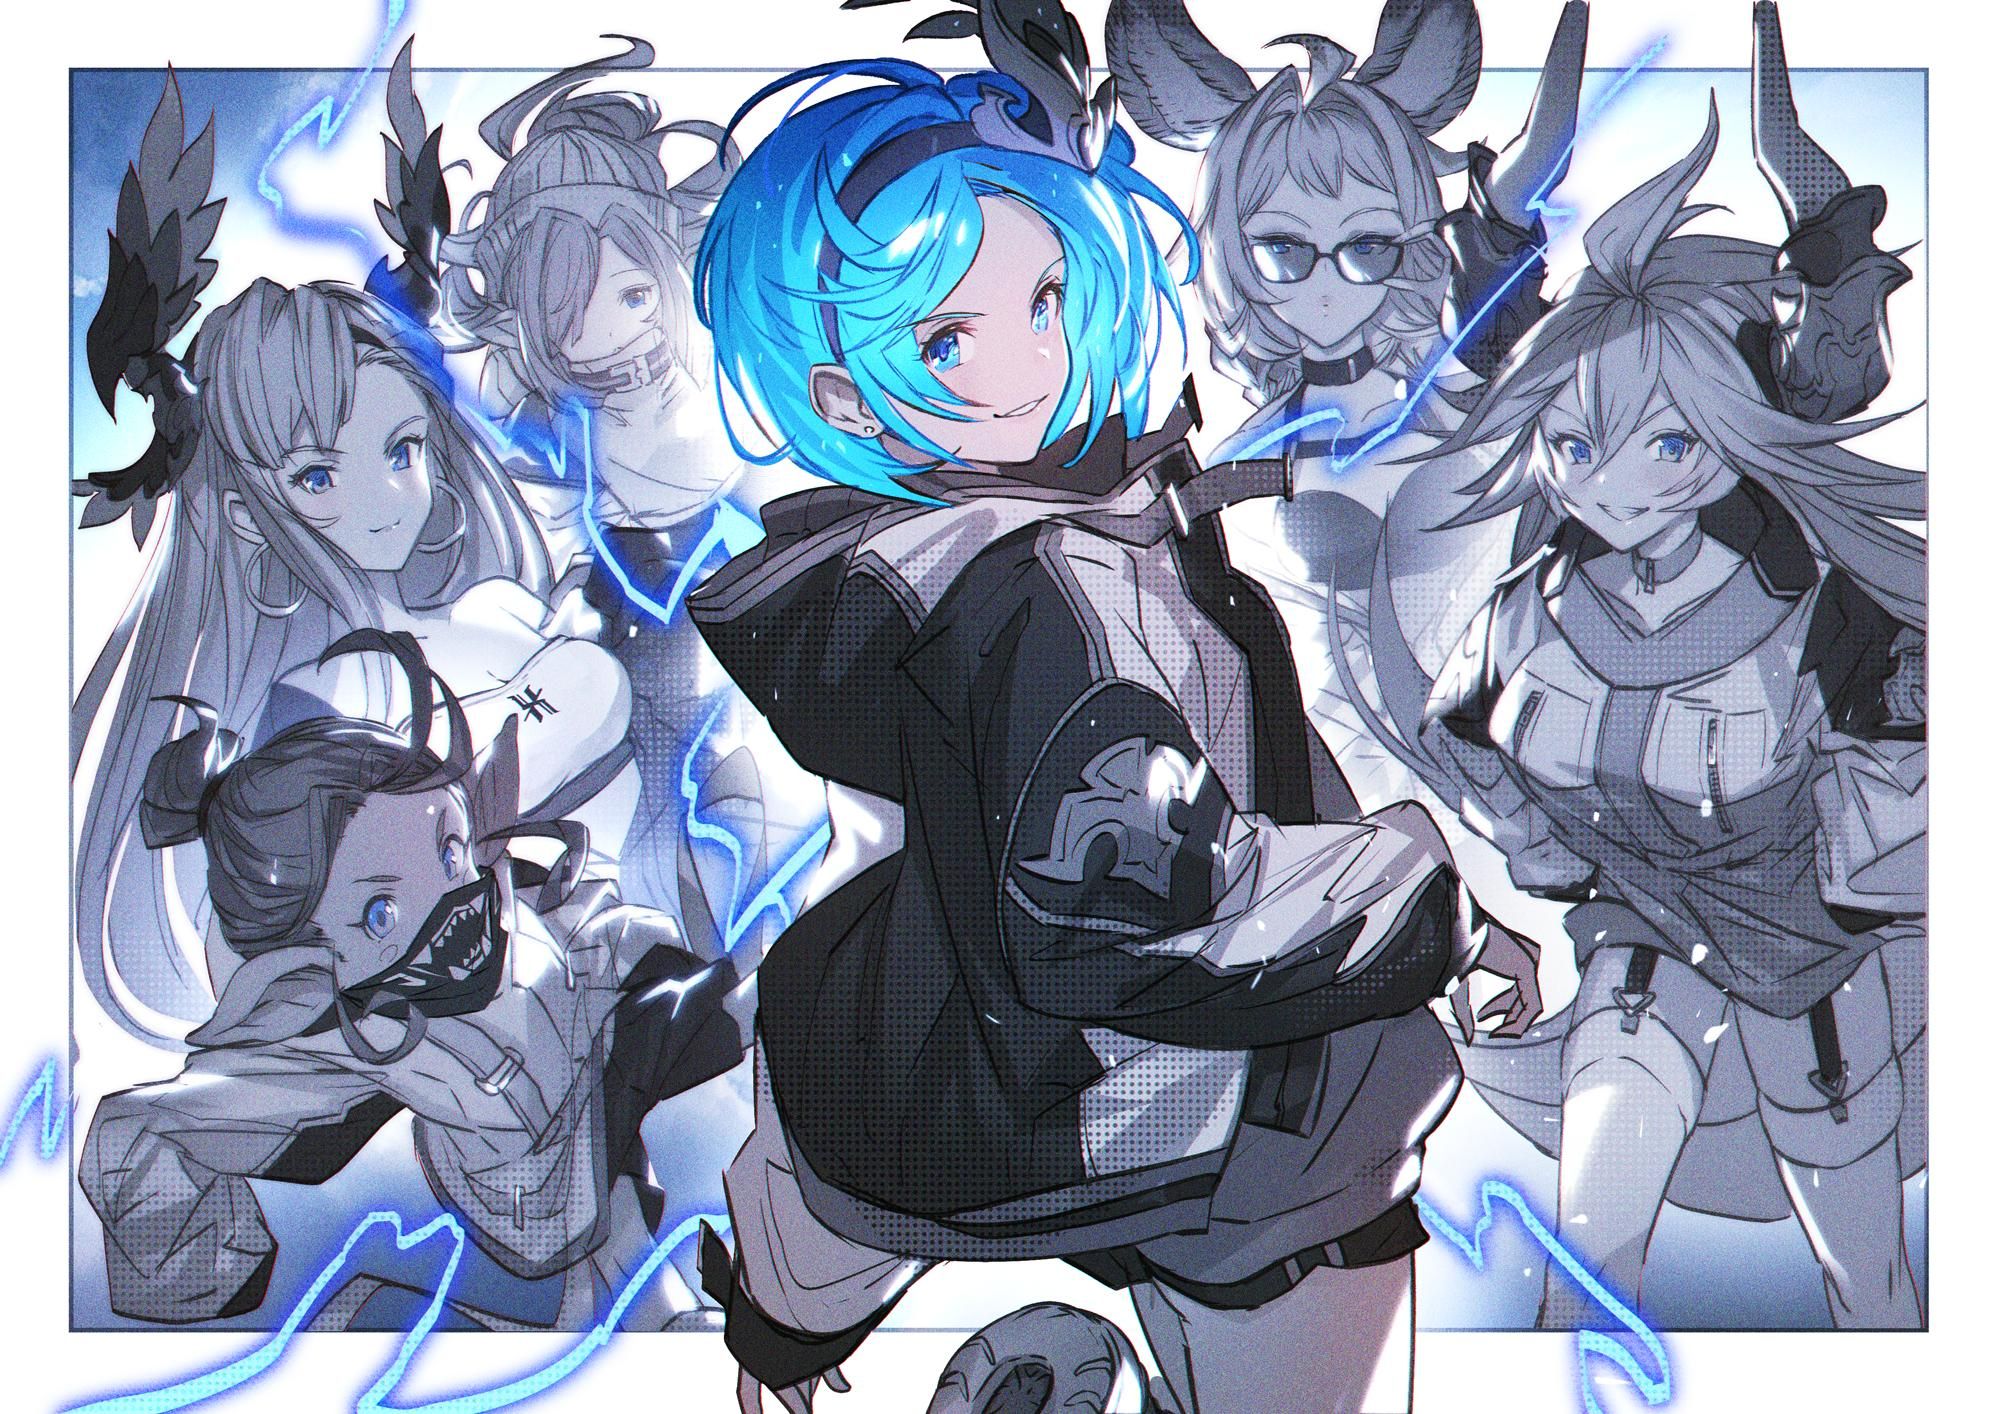 Pin oleh C J di グランブルーファンタジー di 2020 Seni anime, Seni